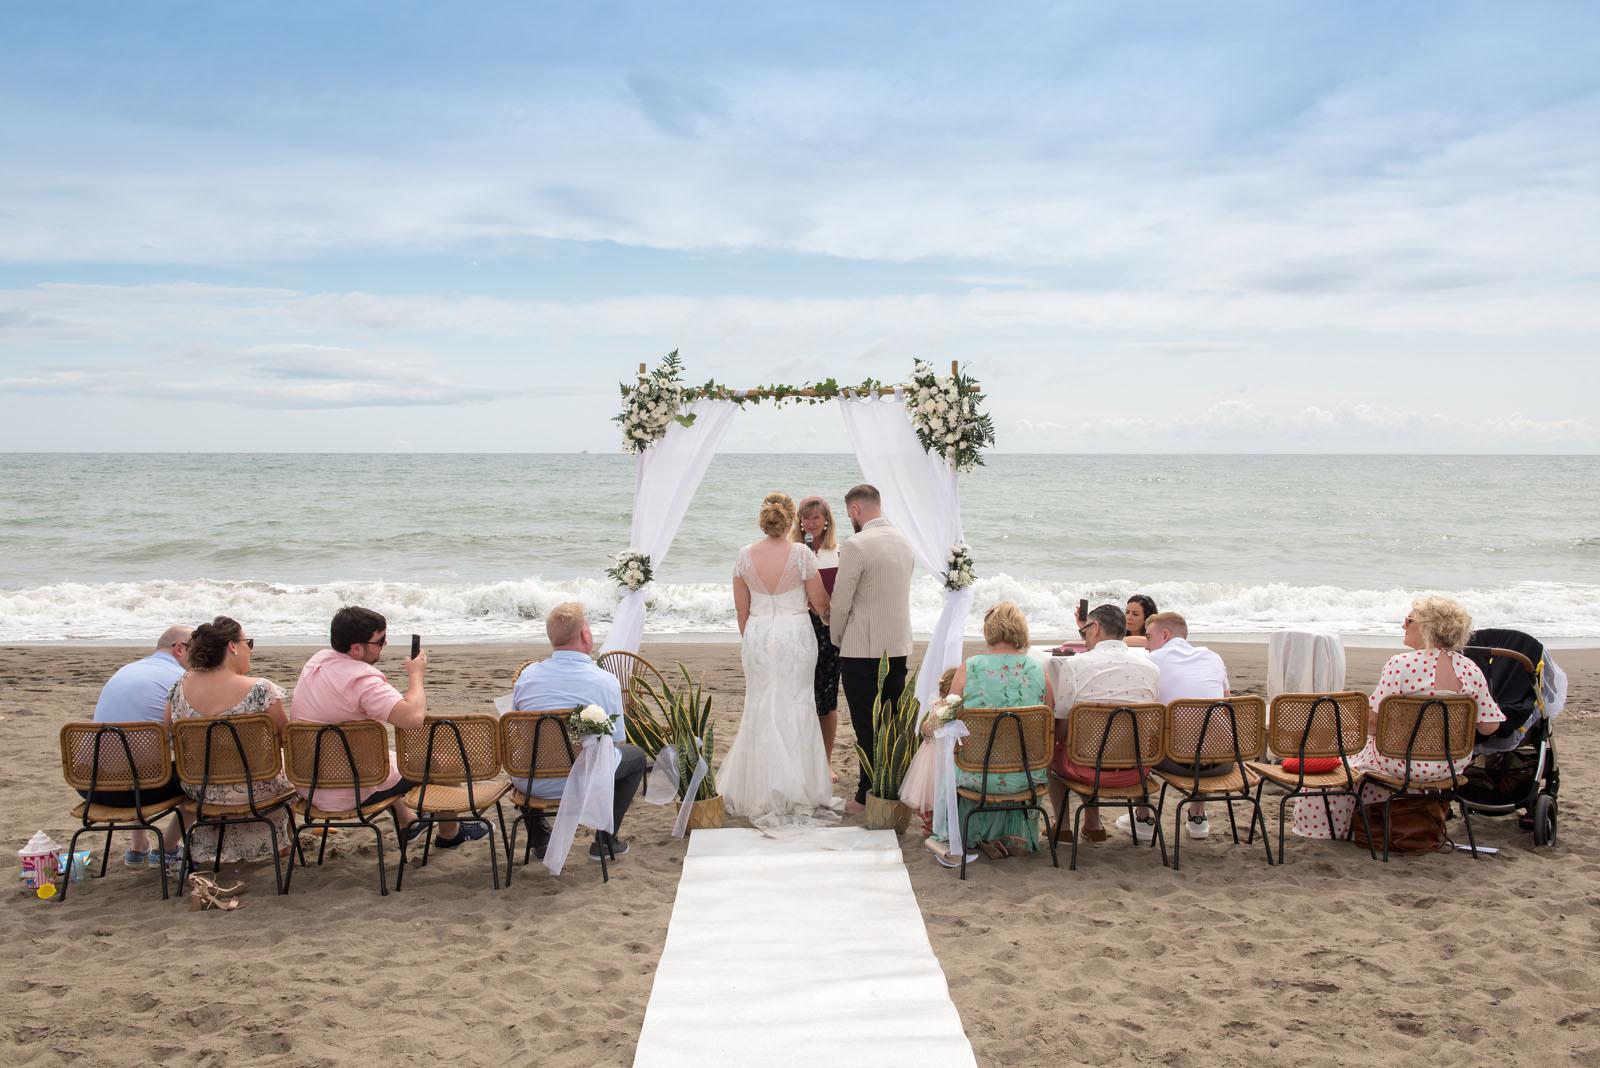 Debbie Skyrme Celebrant Spain officiating beach wedding at Torremolinos in Malaga